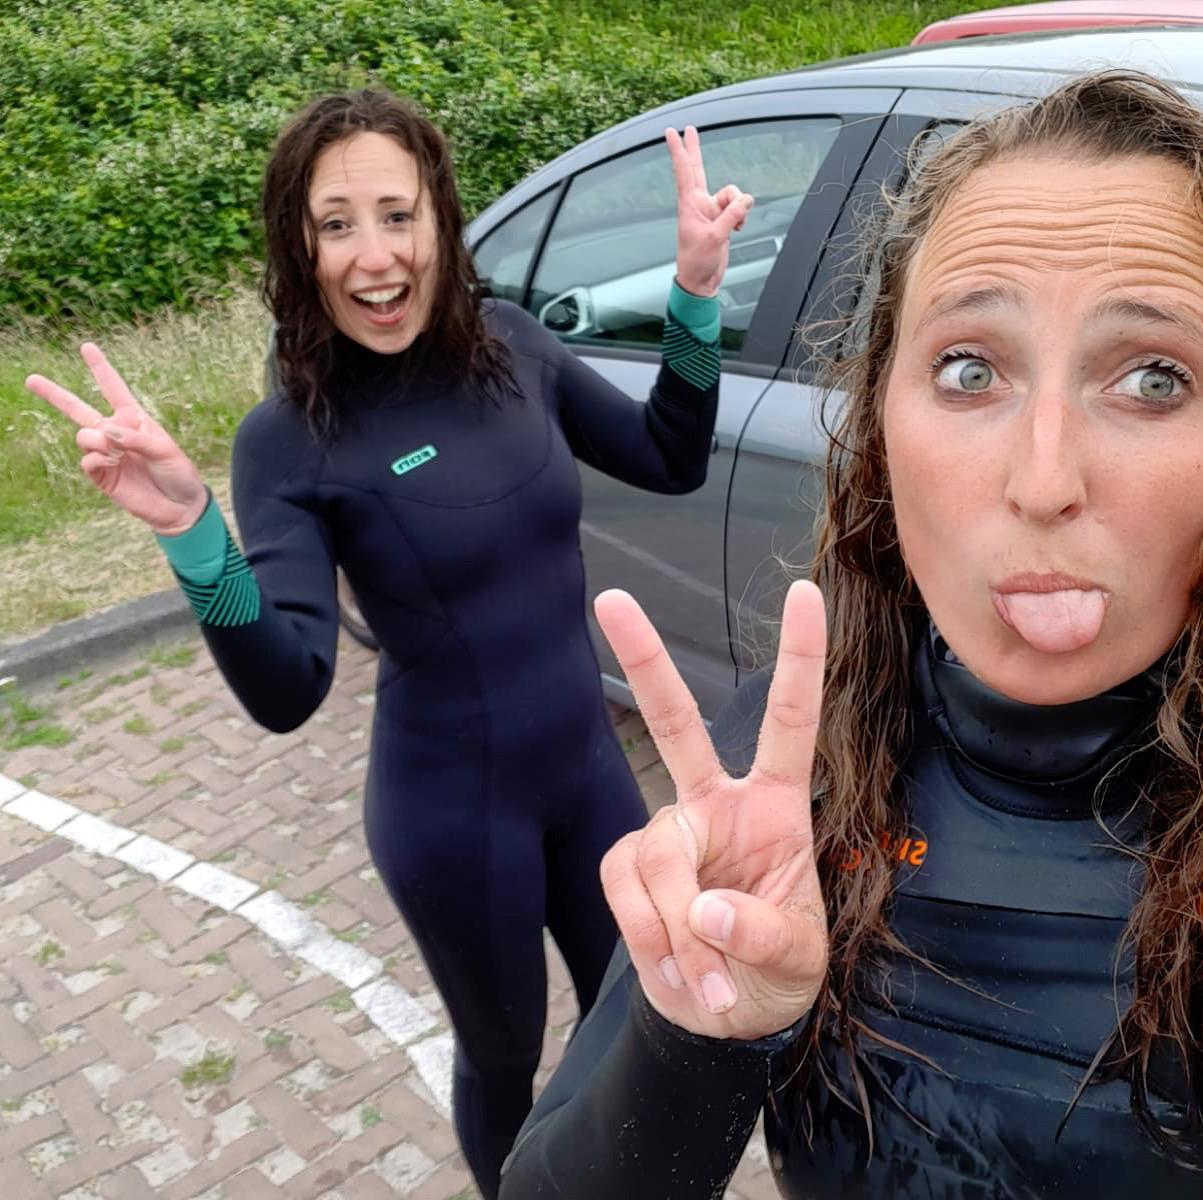 Ryanne_vrijn@hotmail.com's picture